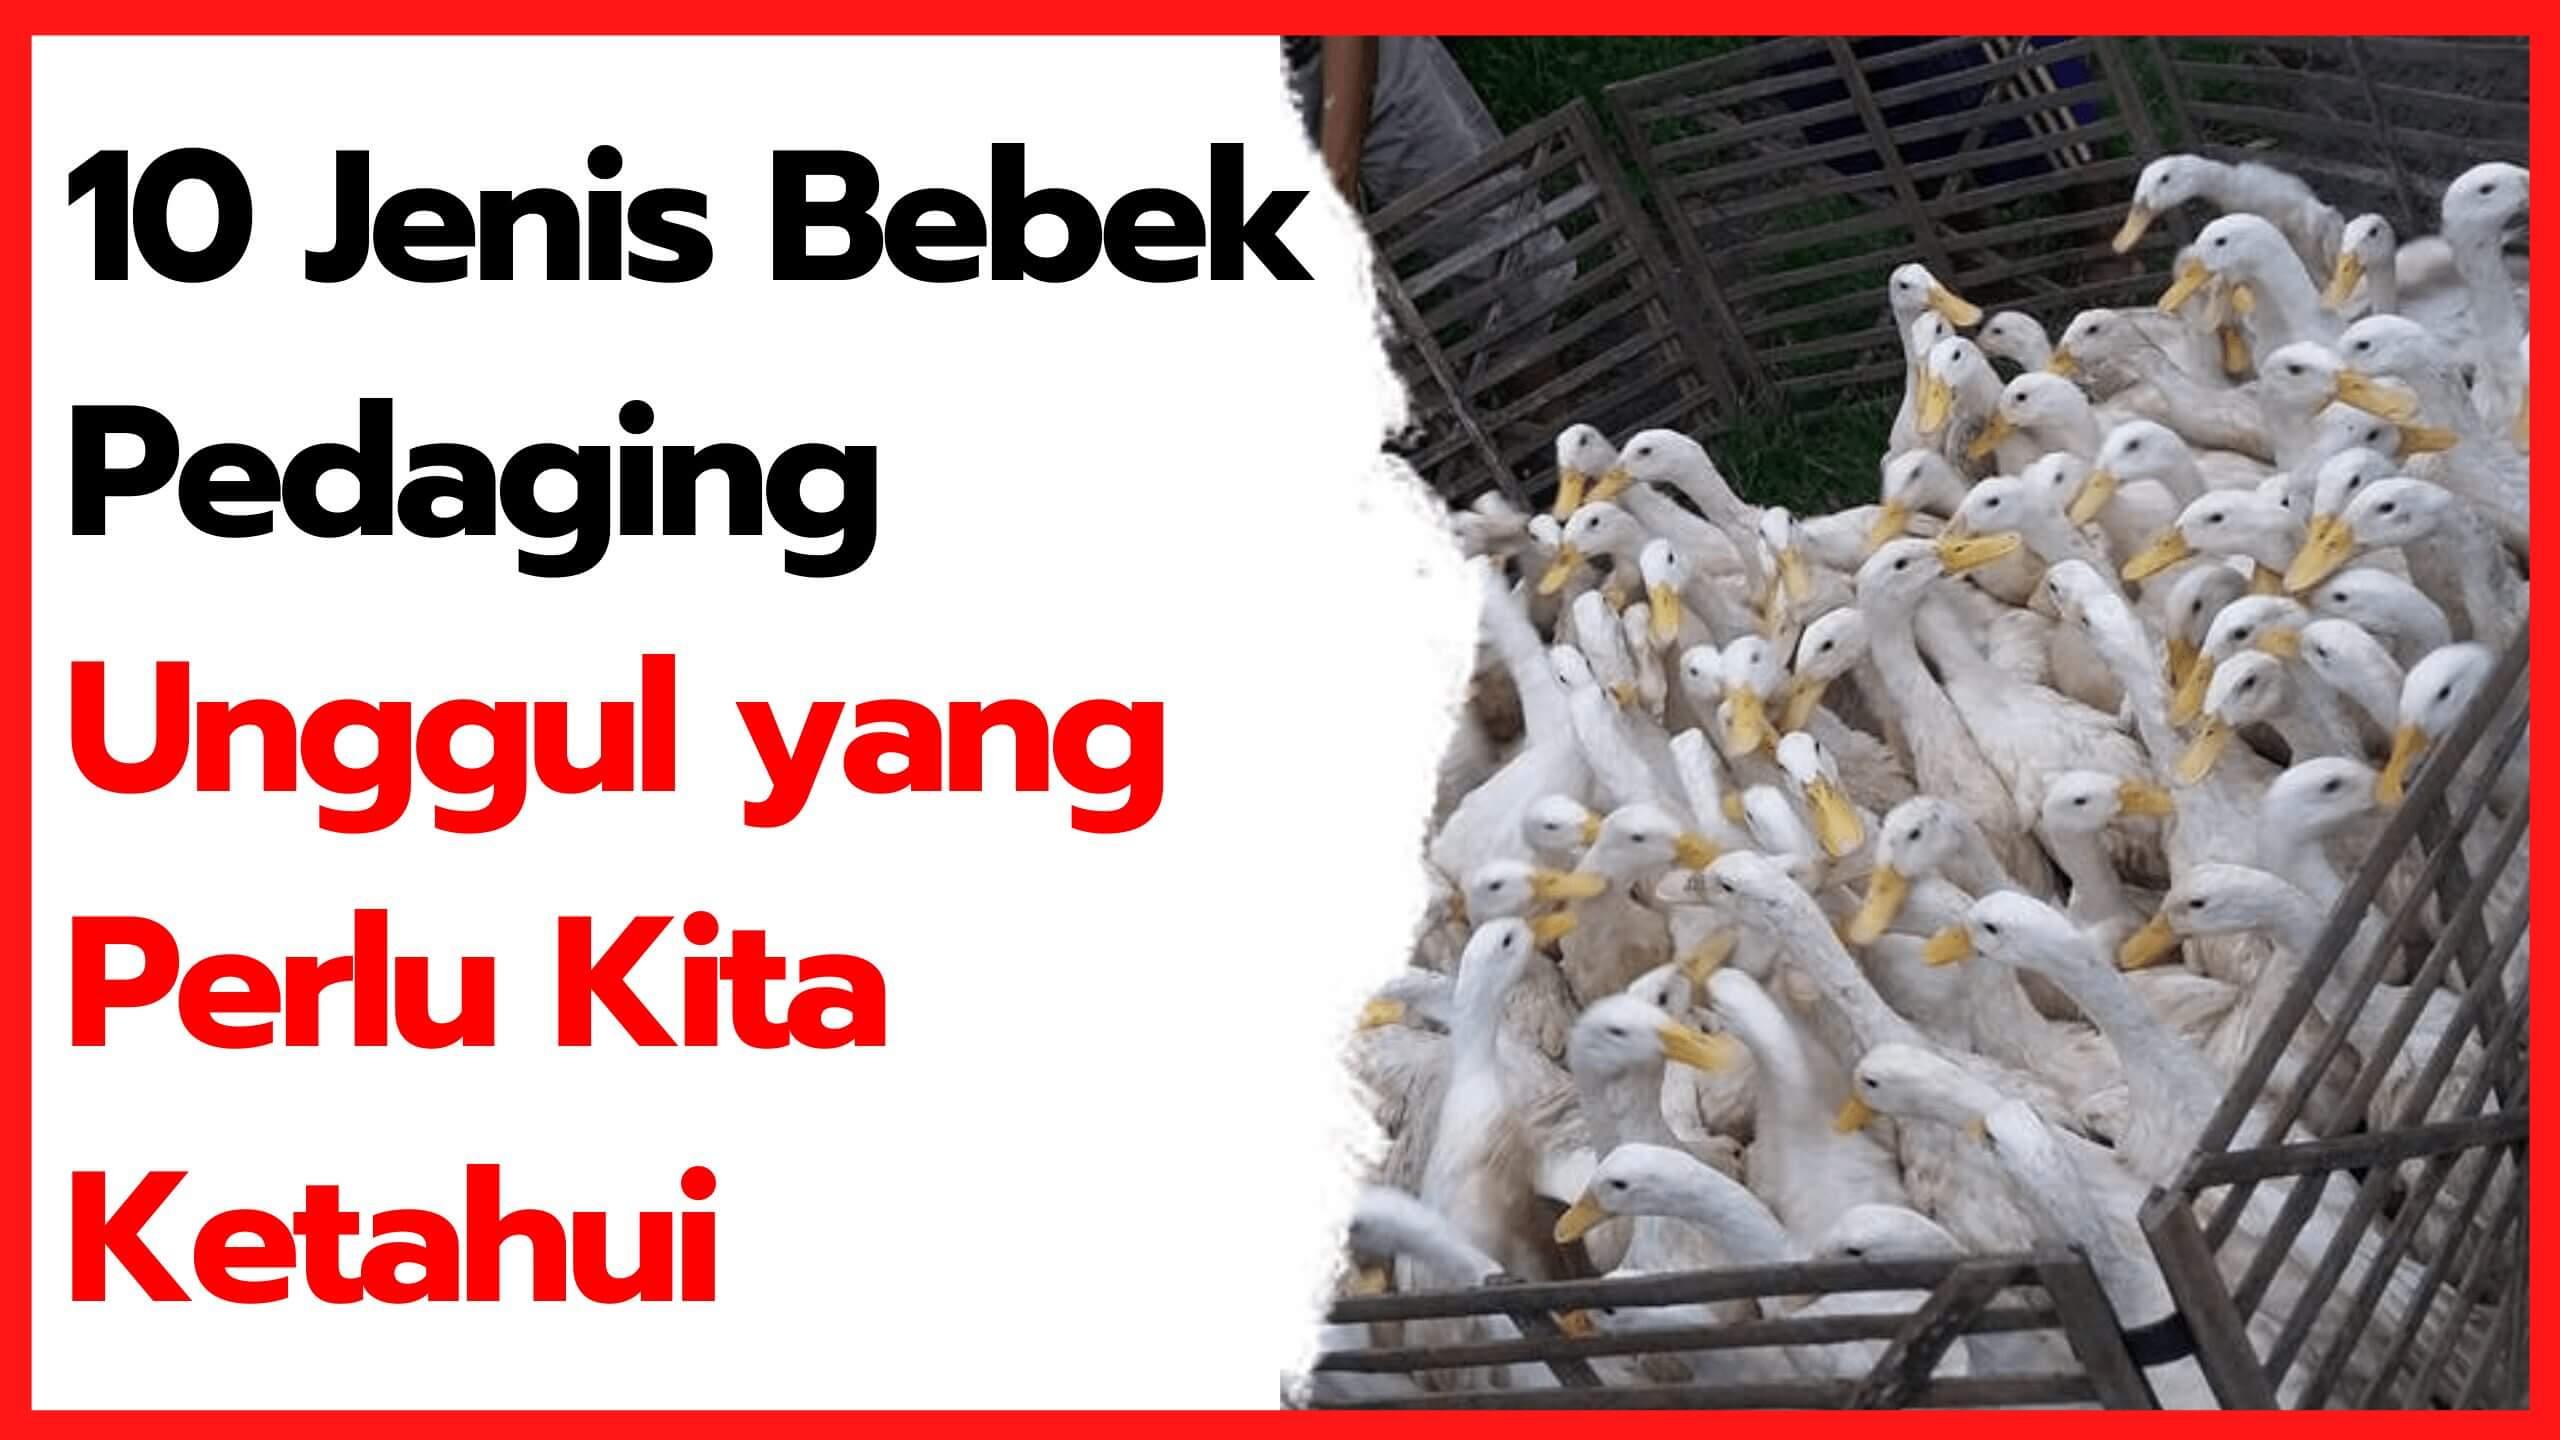 10 Jenis Bebek Pedaging Unggul yang Perlu Kita Ketahui